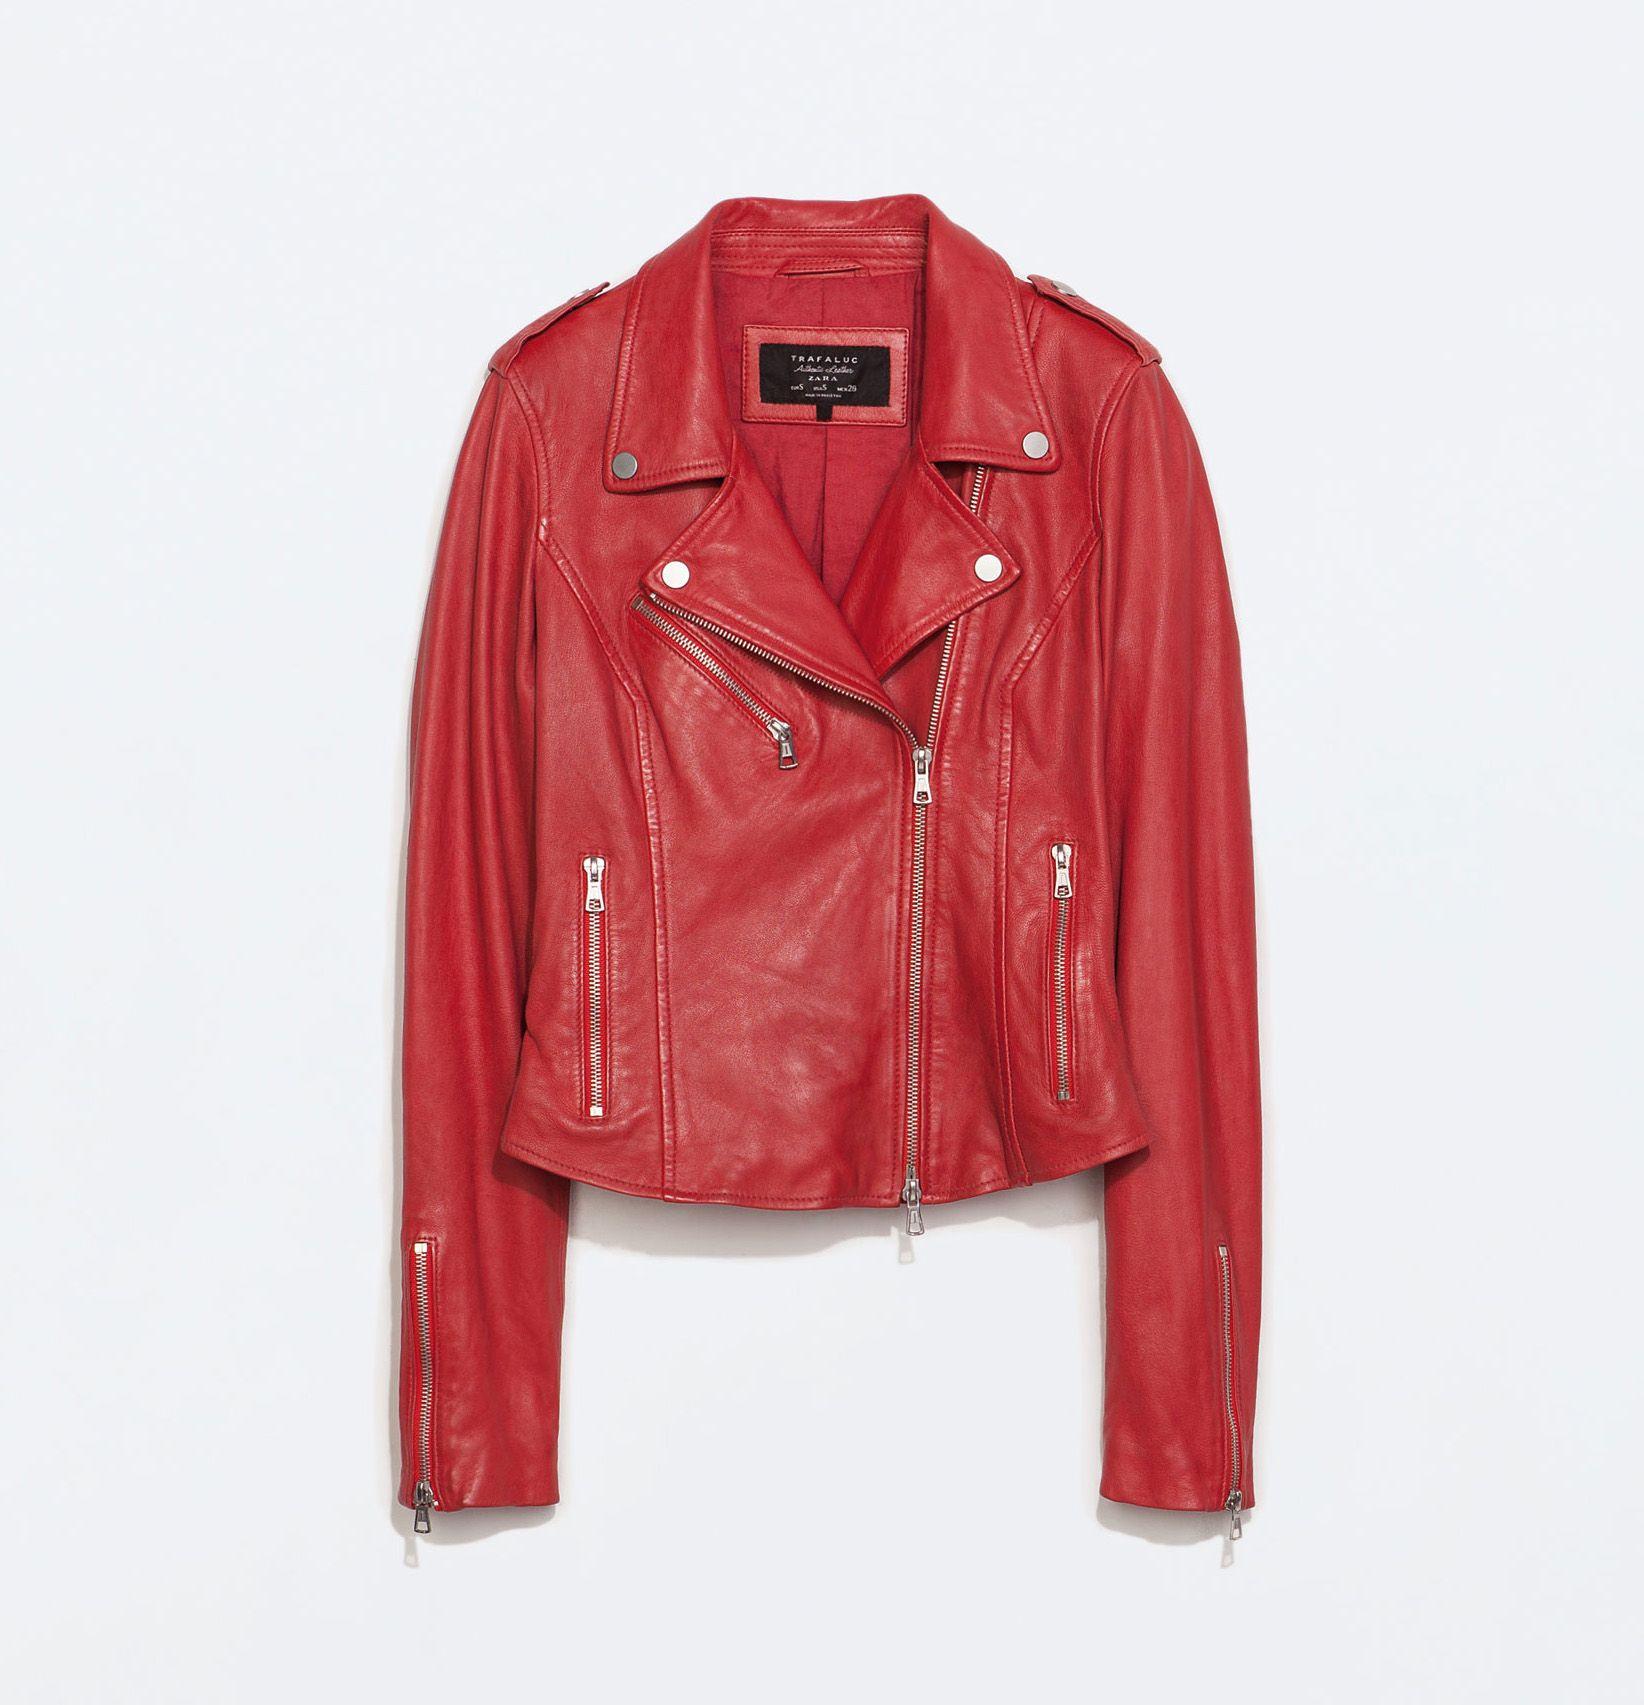 CHAQUETA DE CUERO ROJA STRADIVARIUS  chaqueta  chaquetadecuero  cuero   stradivarius 00e51b6c2368